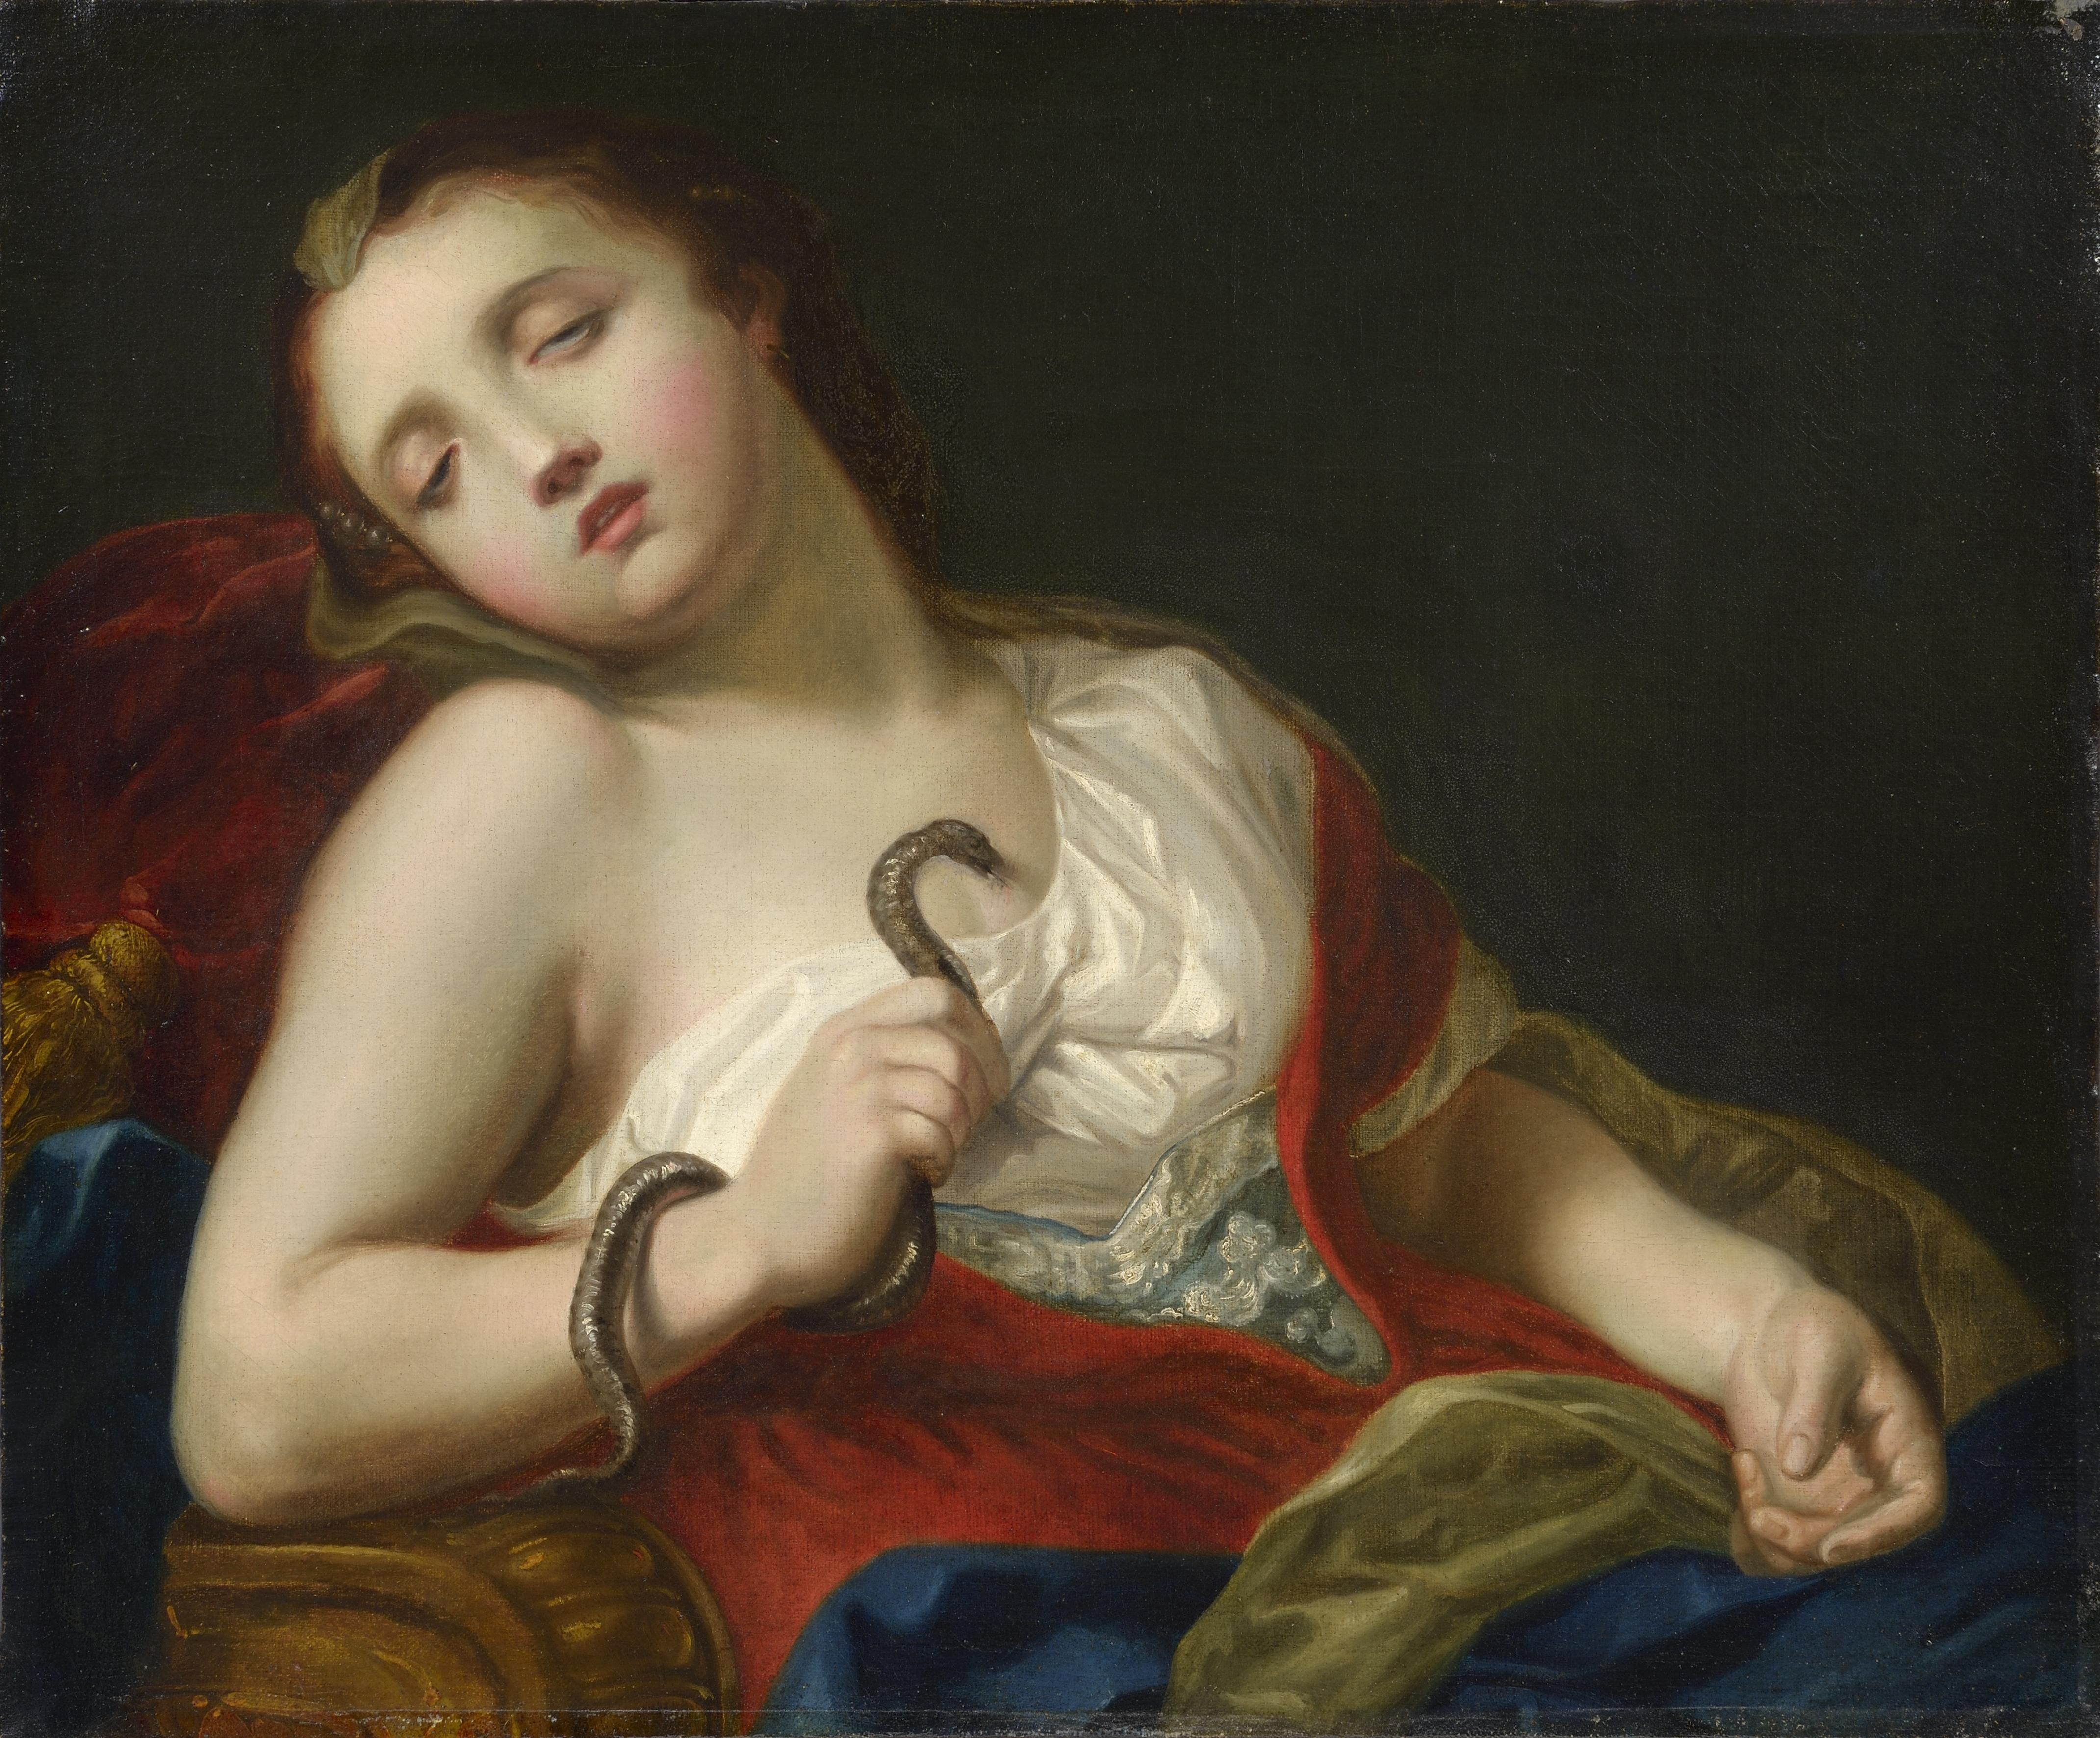 Giambettino Cignaroli_Cleopatra, 1770 circa